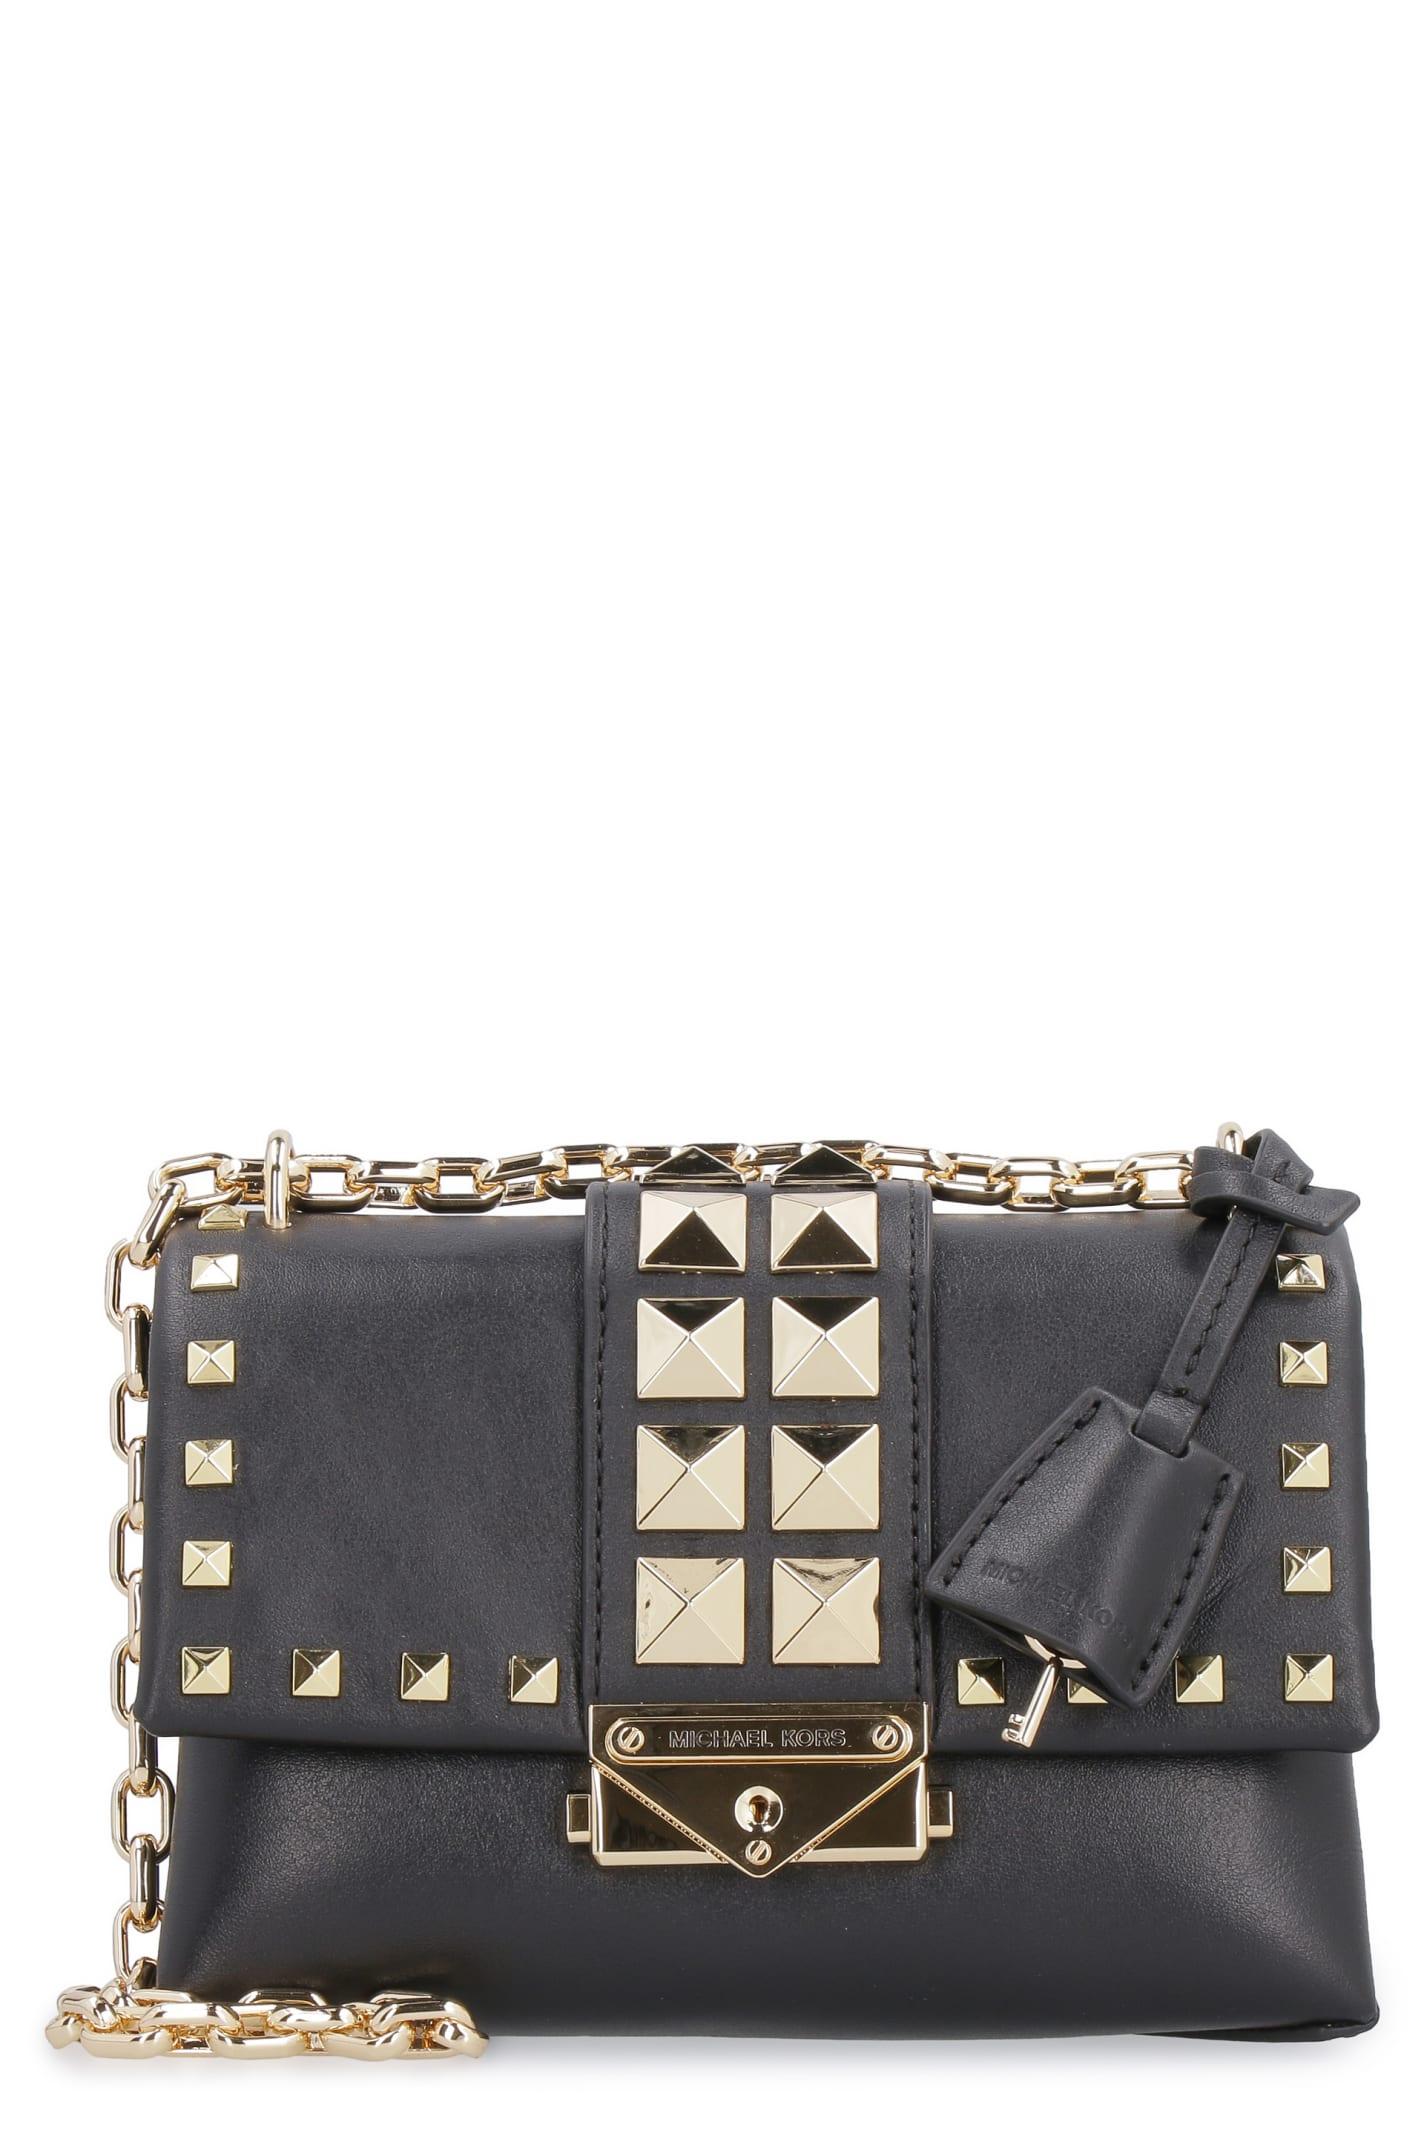 04239b184bd Michael Kors Cece Studded Leather Mini-bag